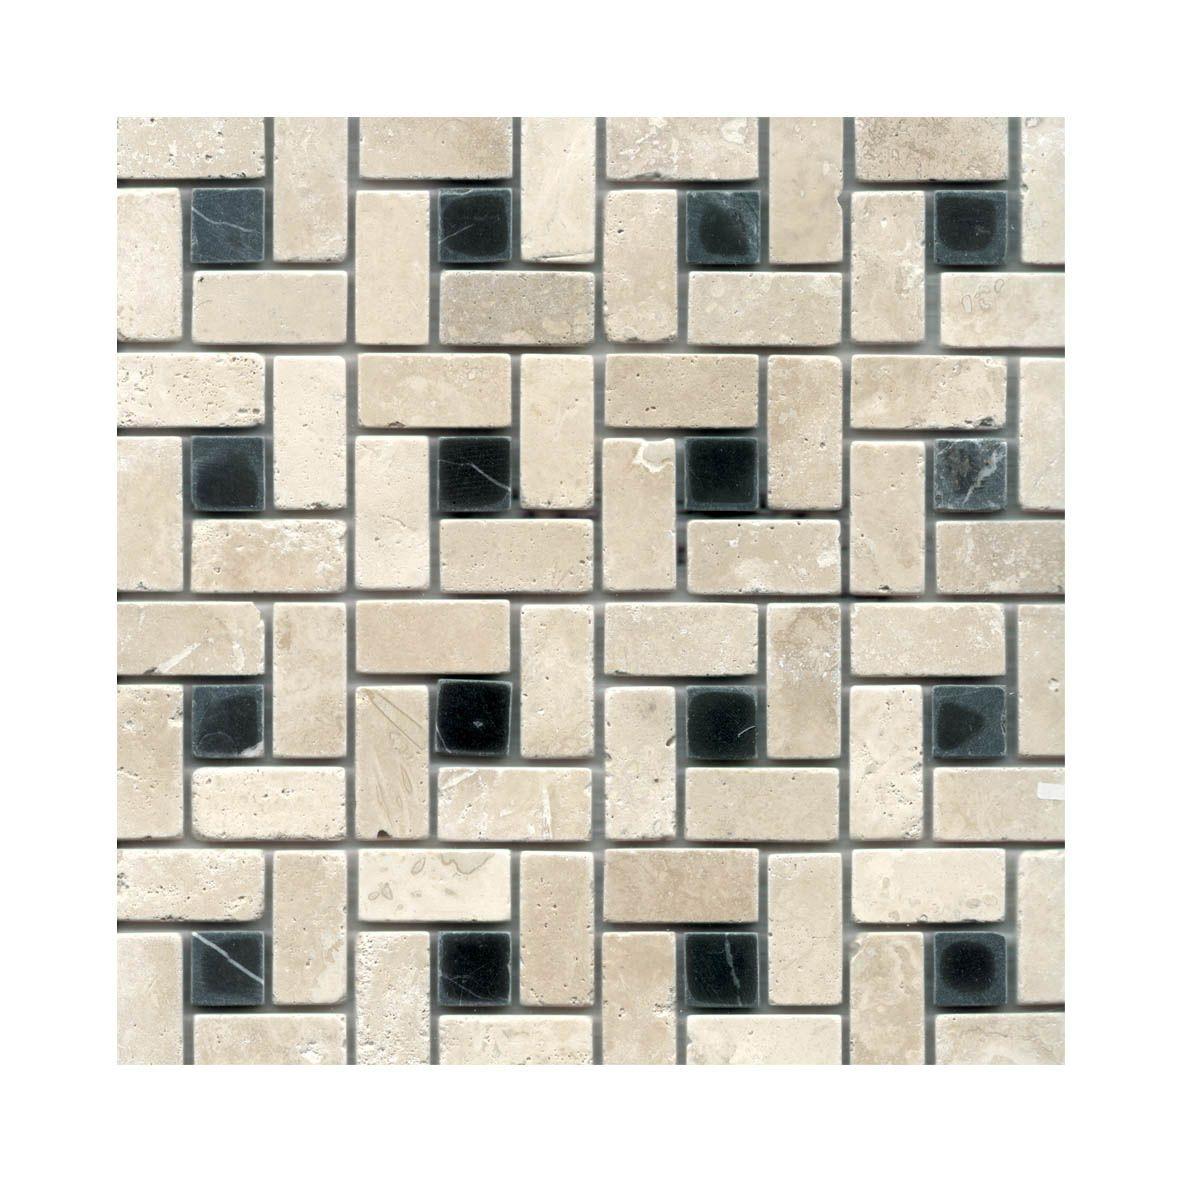 Cheap Clearance Tiles | Tumbled Travertine - White/Thoros Black Dot ...